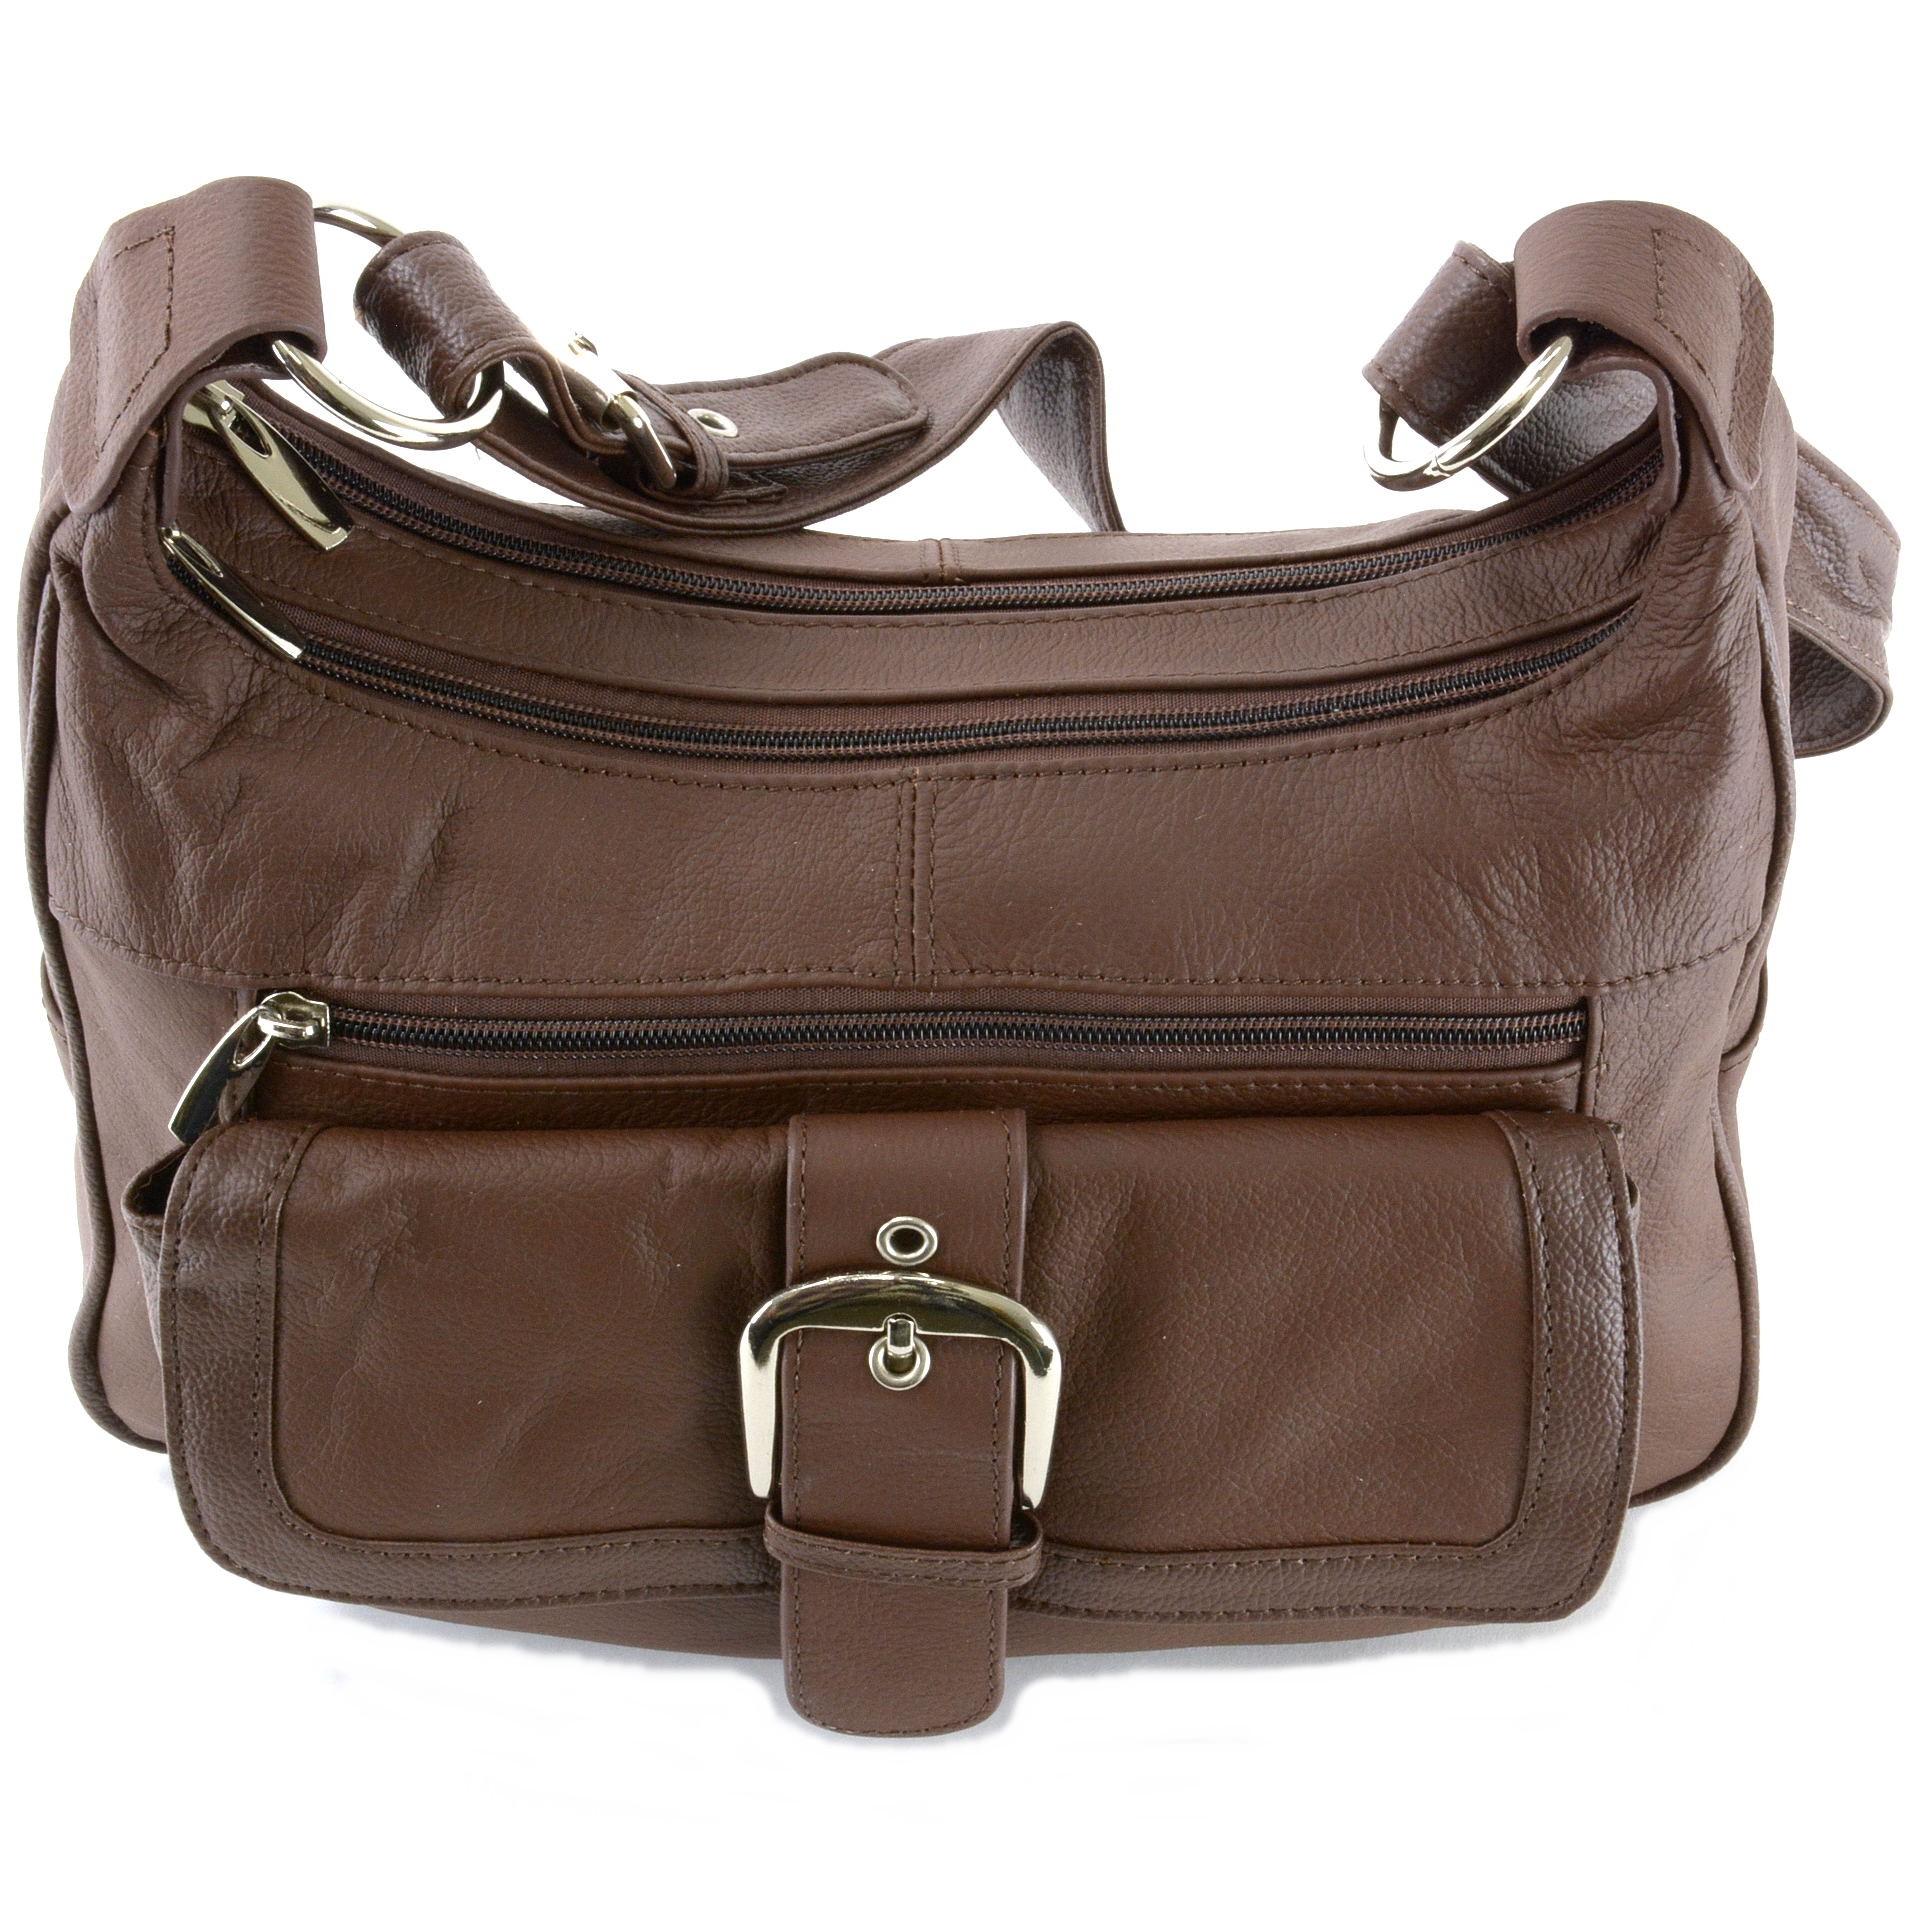 Popular The Cambridge Satchel Company Womenu0026#39;s Cloud Bag With Handle - Oxblood